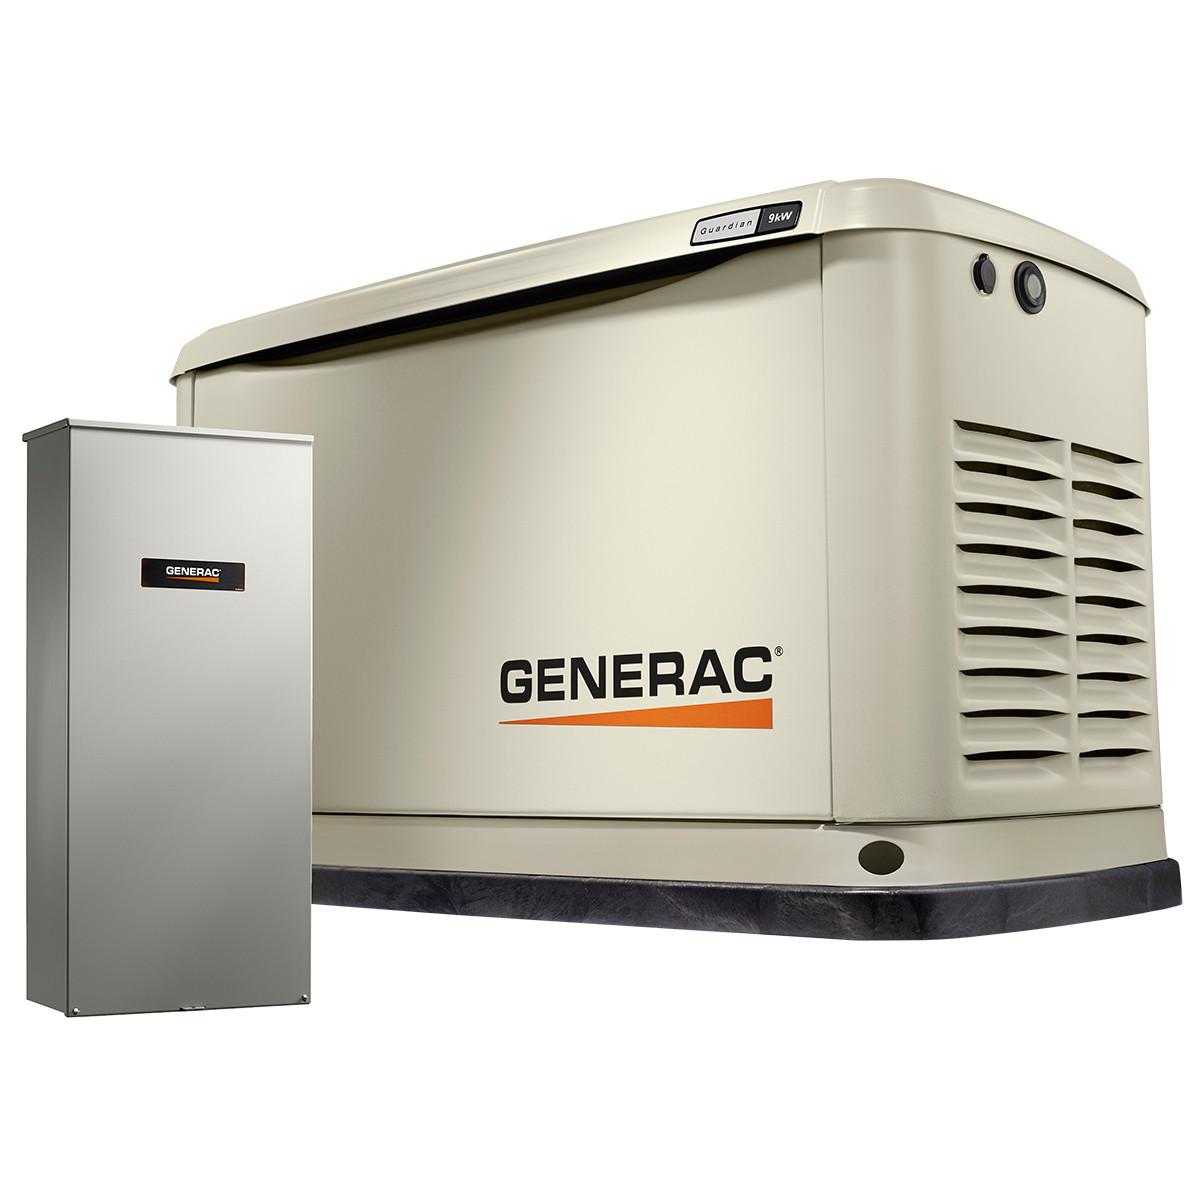 generac 7030 9kw generator 100a 16 circuit transfer switch 200 amp panel wiring diagram wiring diagram for generac 22kw free download [ 1200 x 1200 Pixel ]